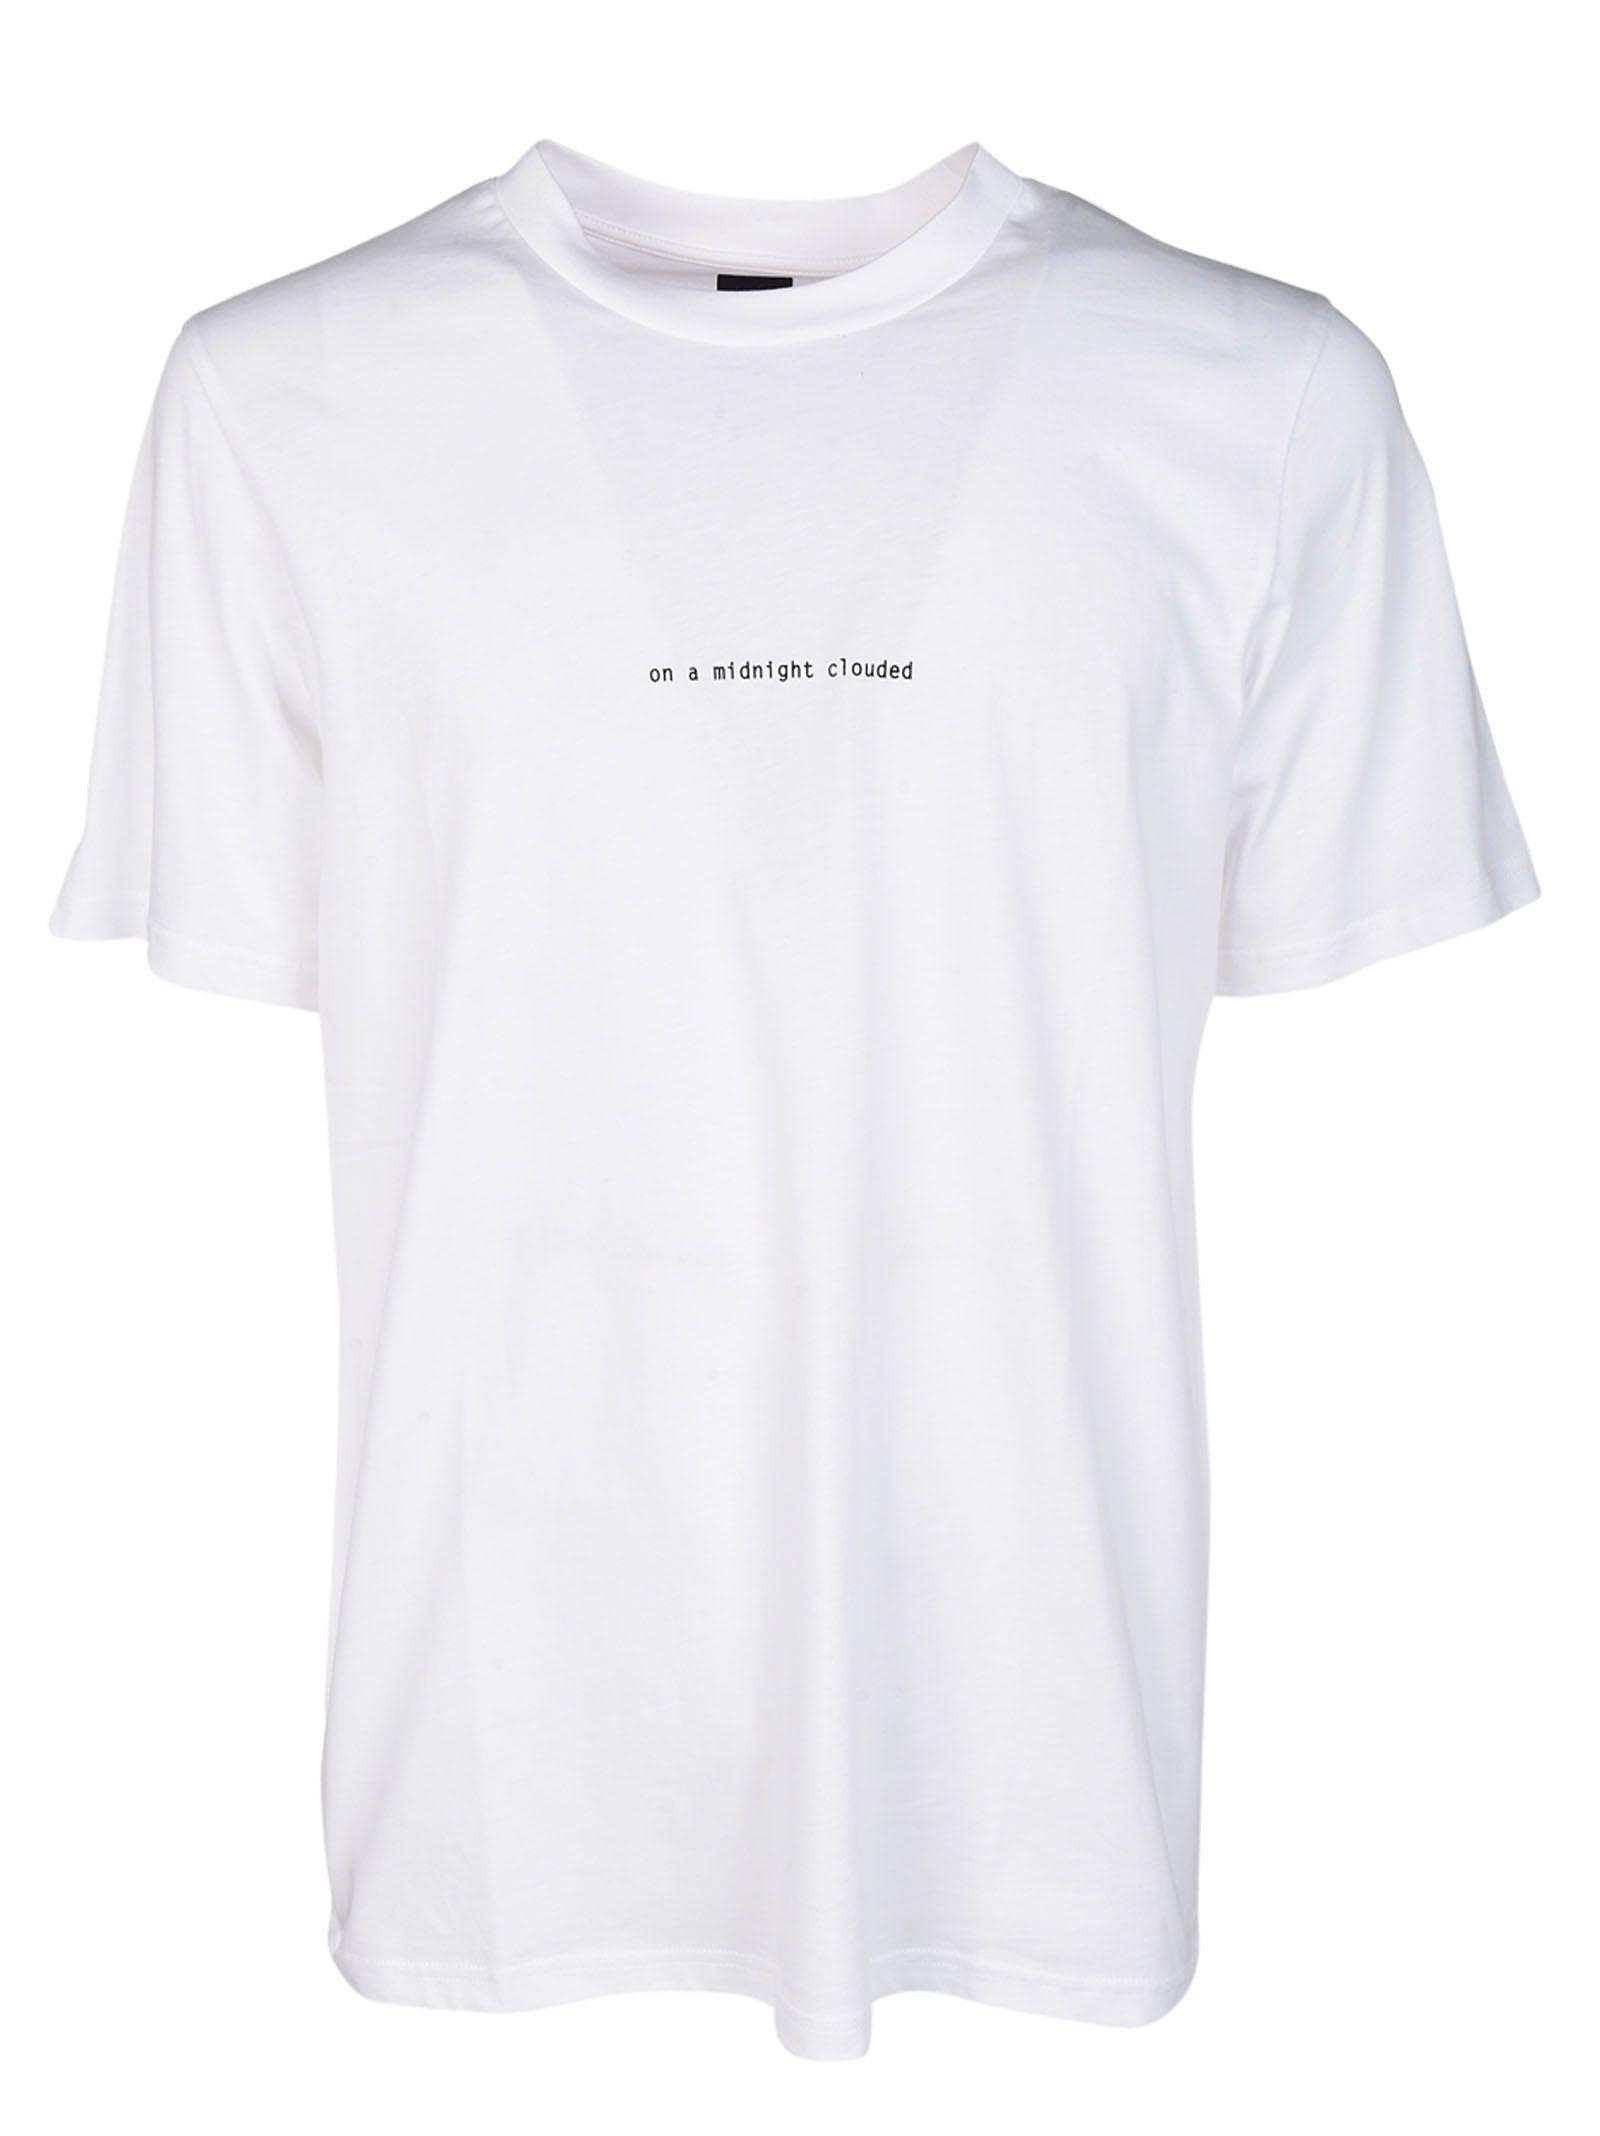 OAMC Horus T-shirt